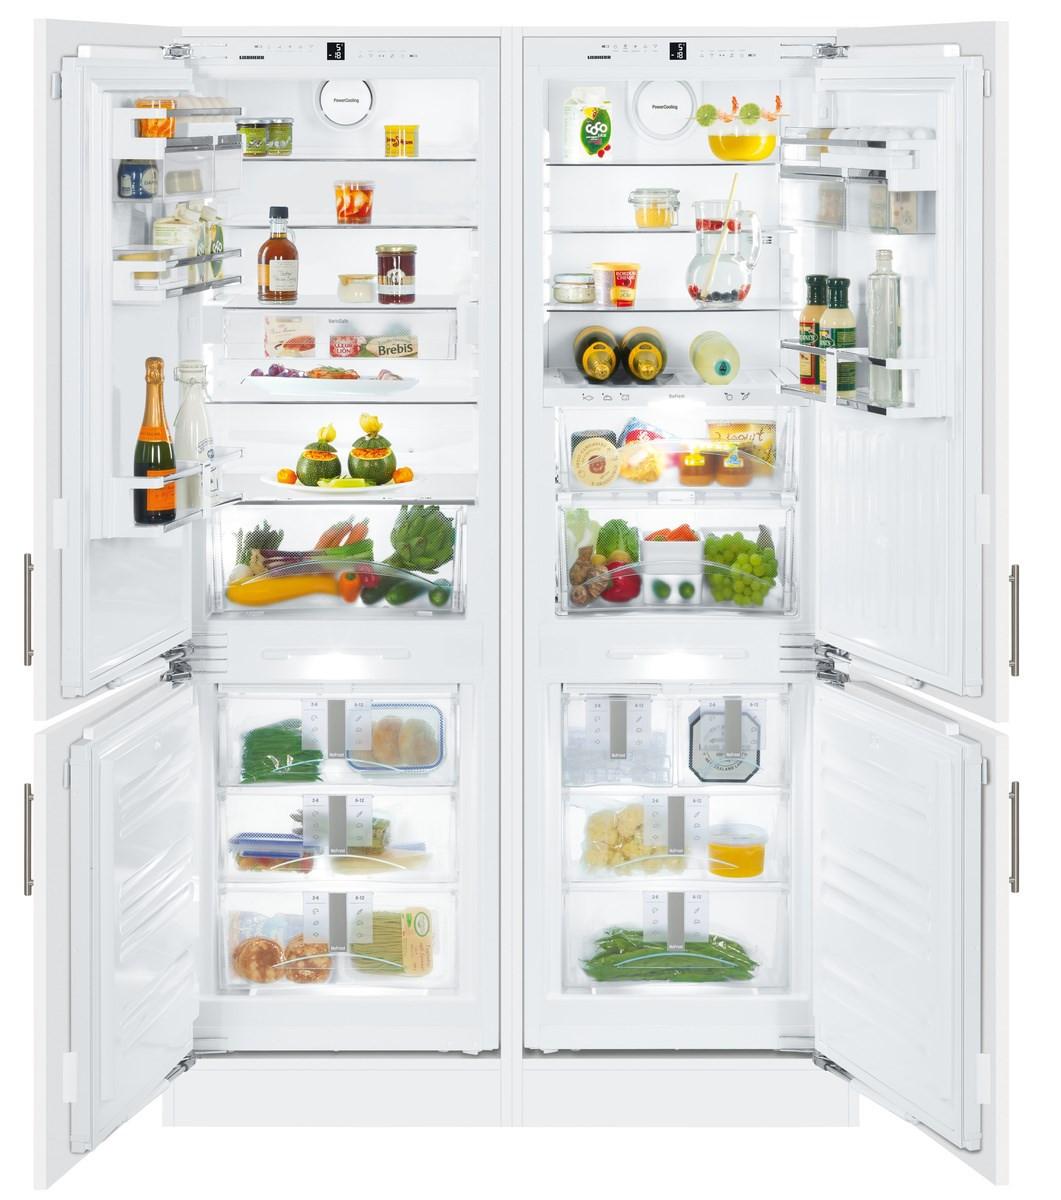 Liebherr SBS66I3 Premium Side-By-Side Built-In Fridge Freezer